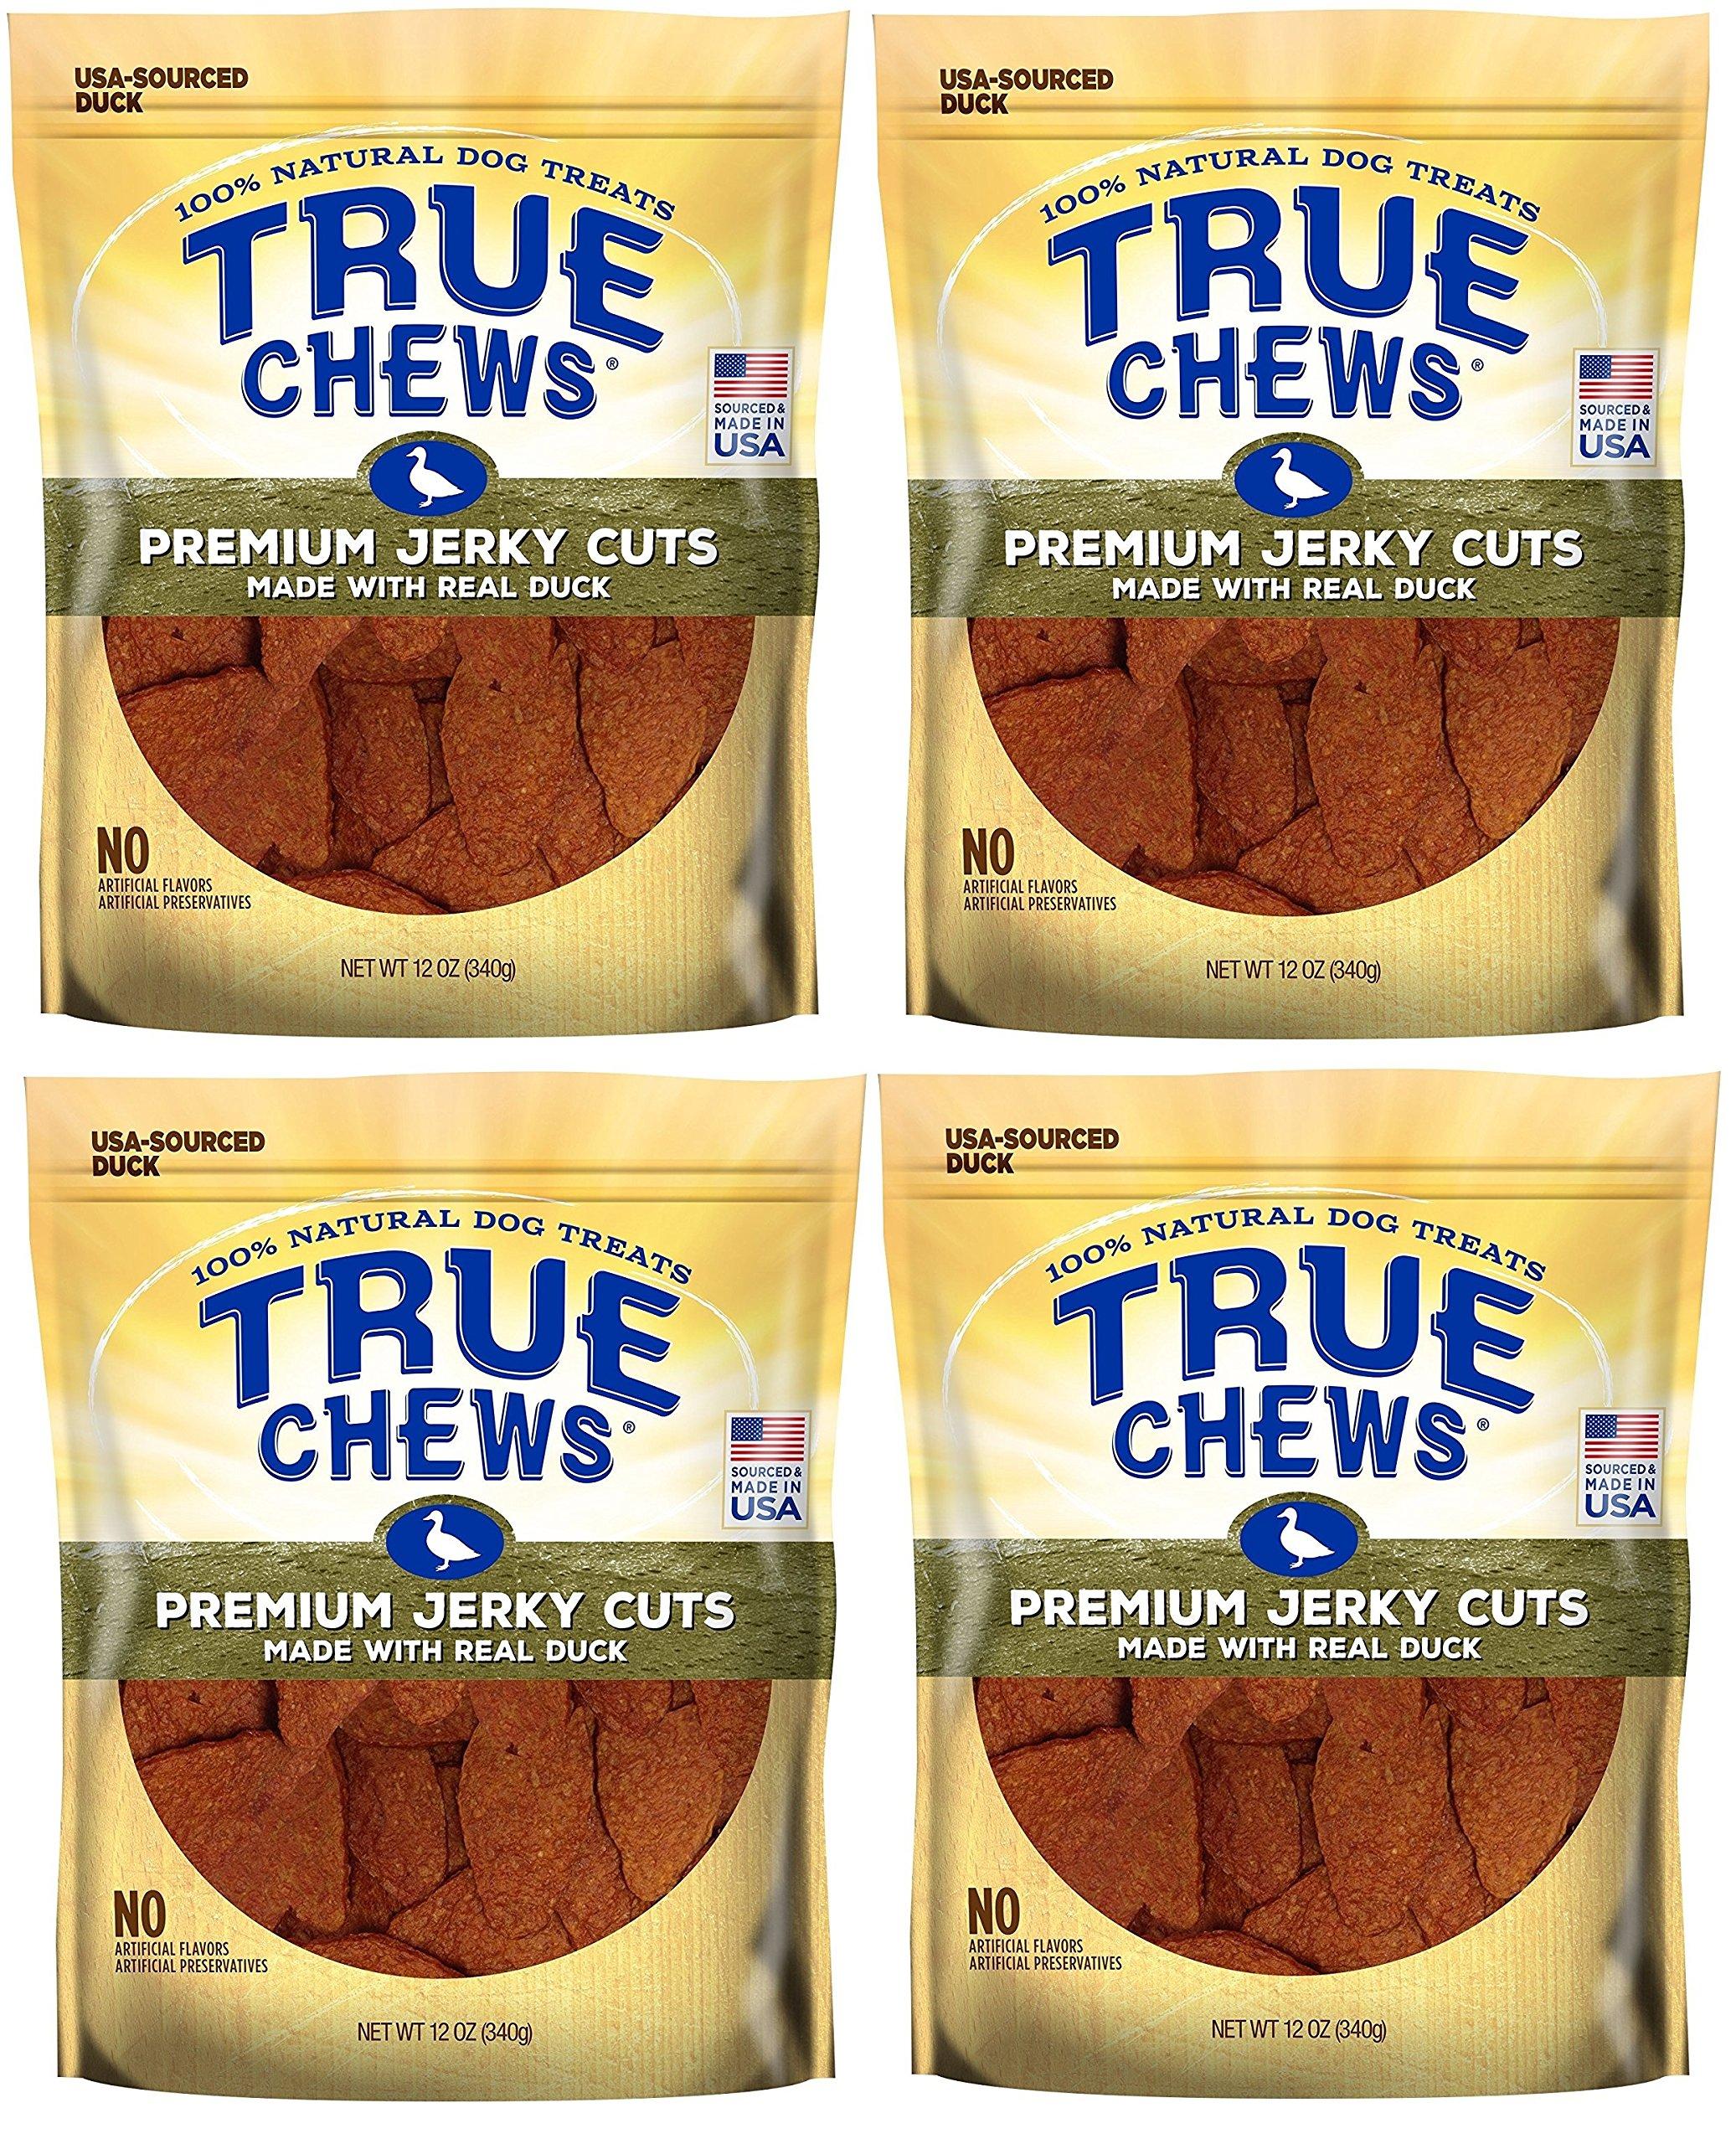 True Chews Dog Treats Premium Duck Jerky 12oz Made in USA (4 Packs) by True Chews (Image #1)